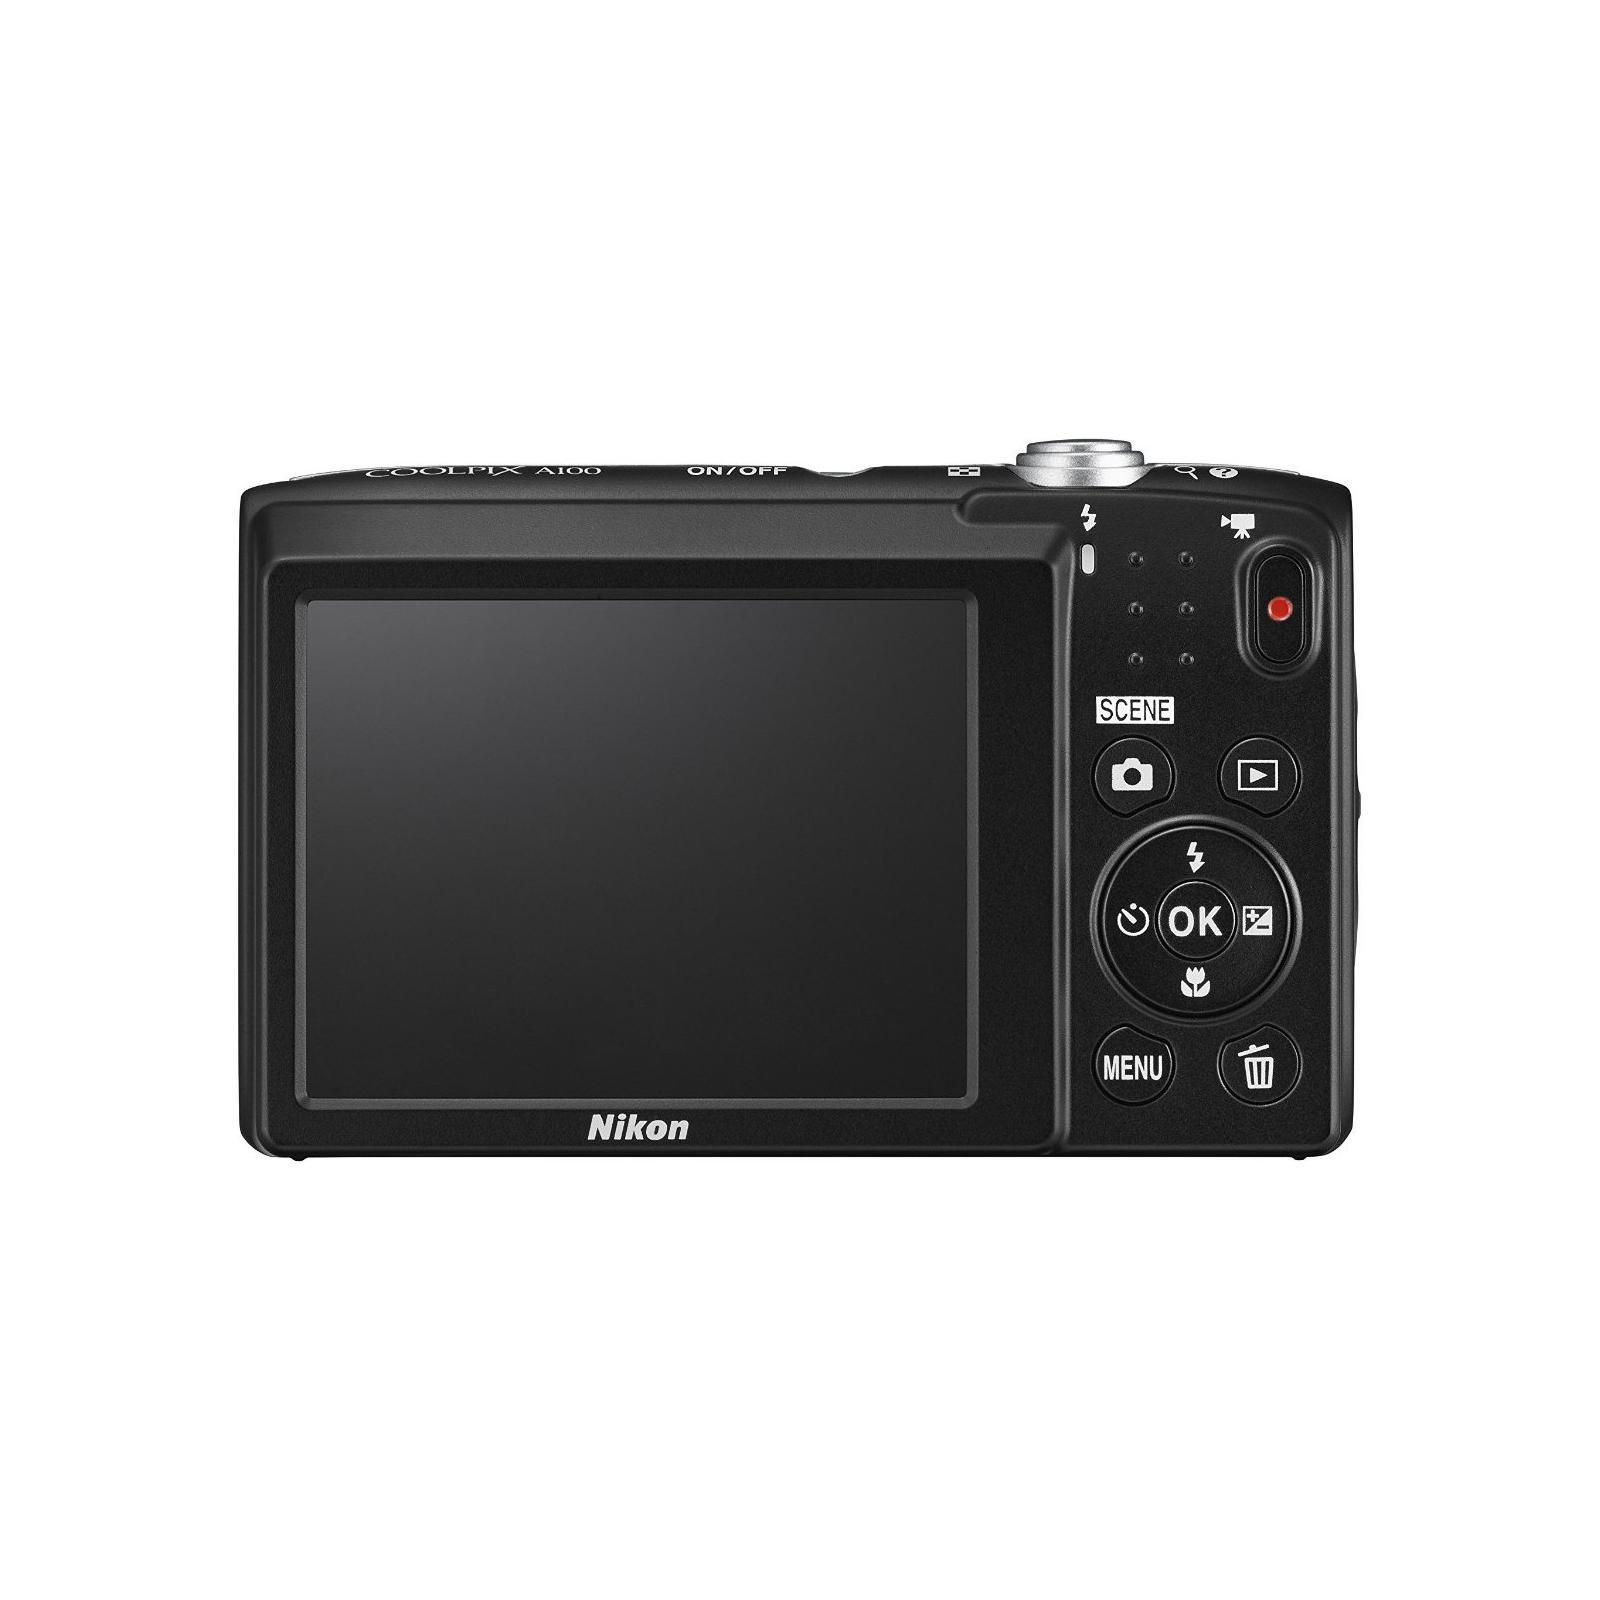 Цифровой фотоаппарат Nikon Coolpix A100 Purple Lineart (VNA974E1) изображение 4